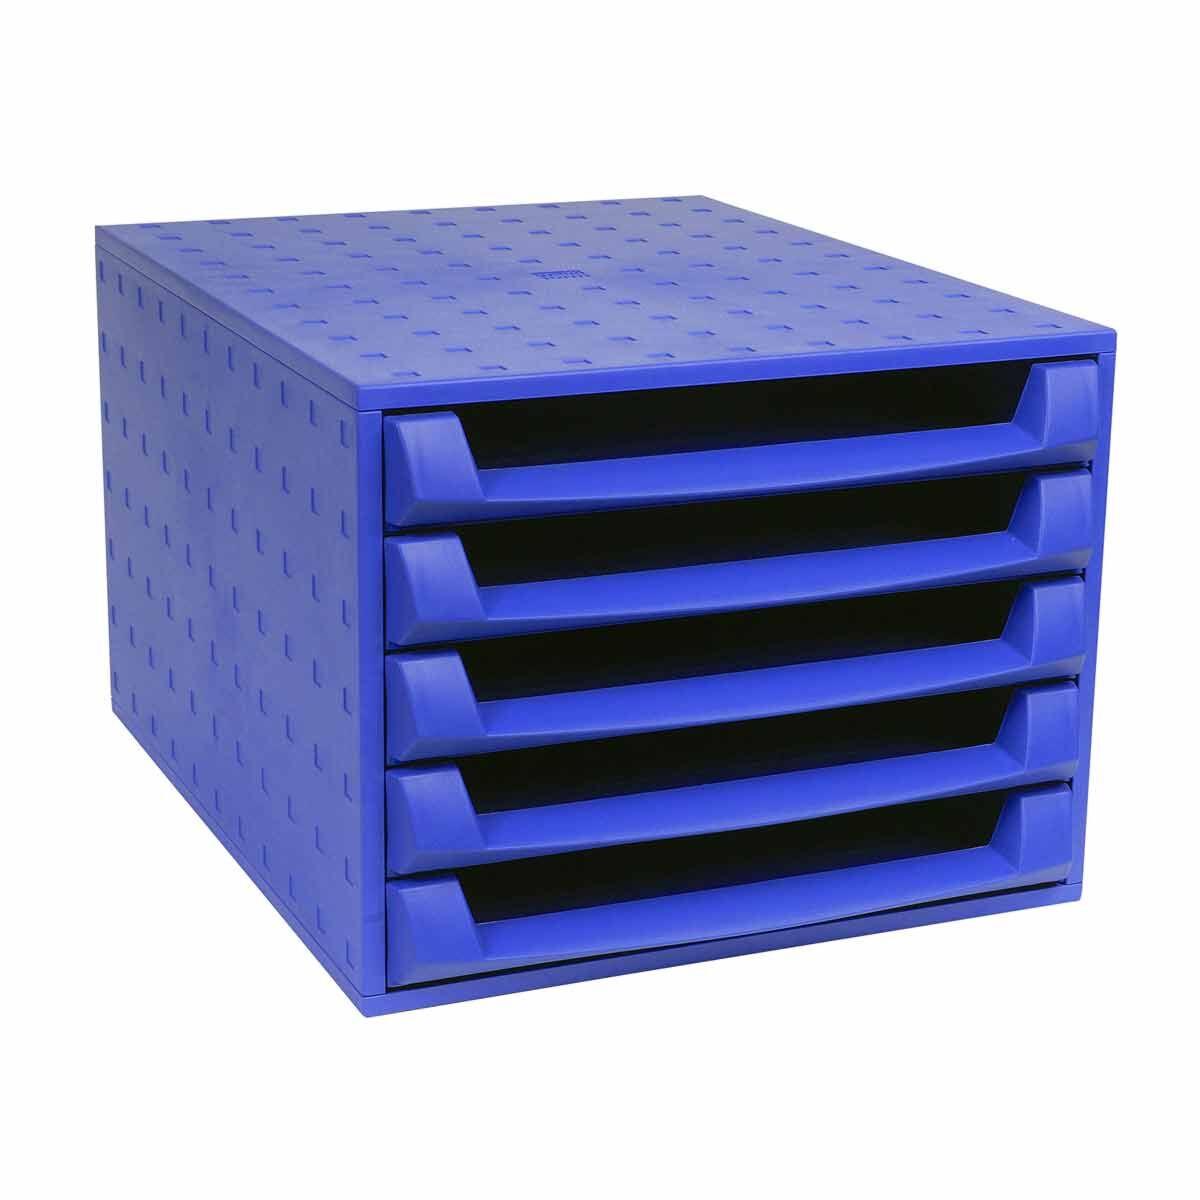 Exacompta The Box Forever 5 Drawer Unit